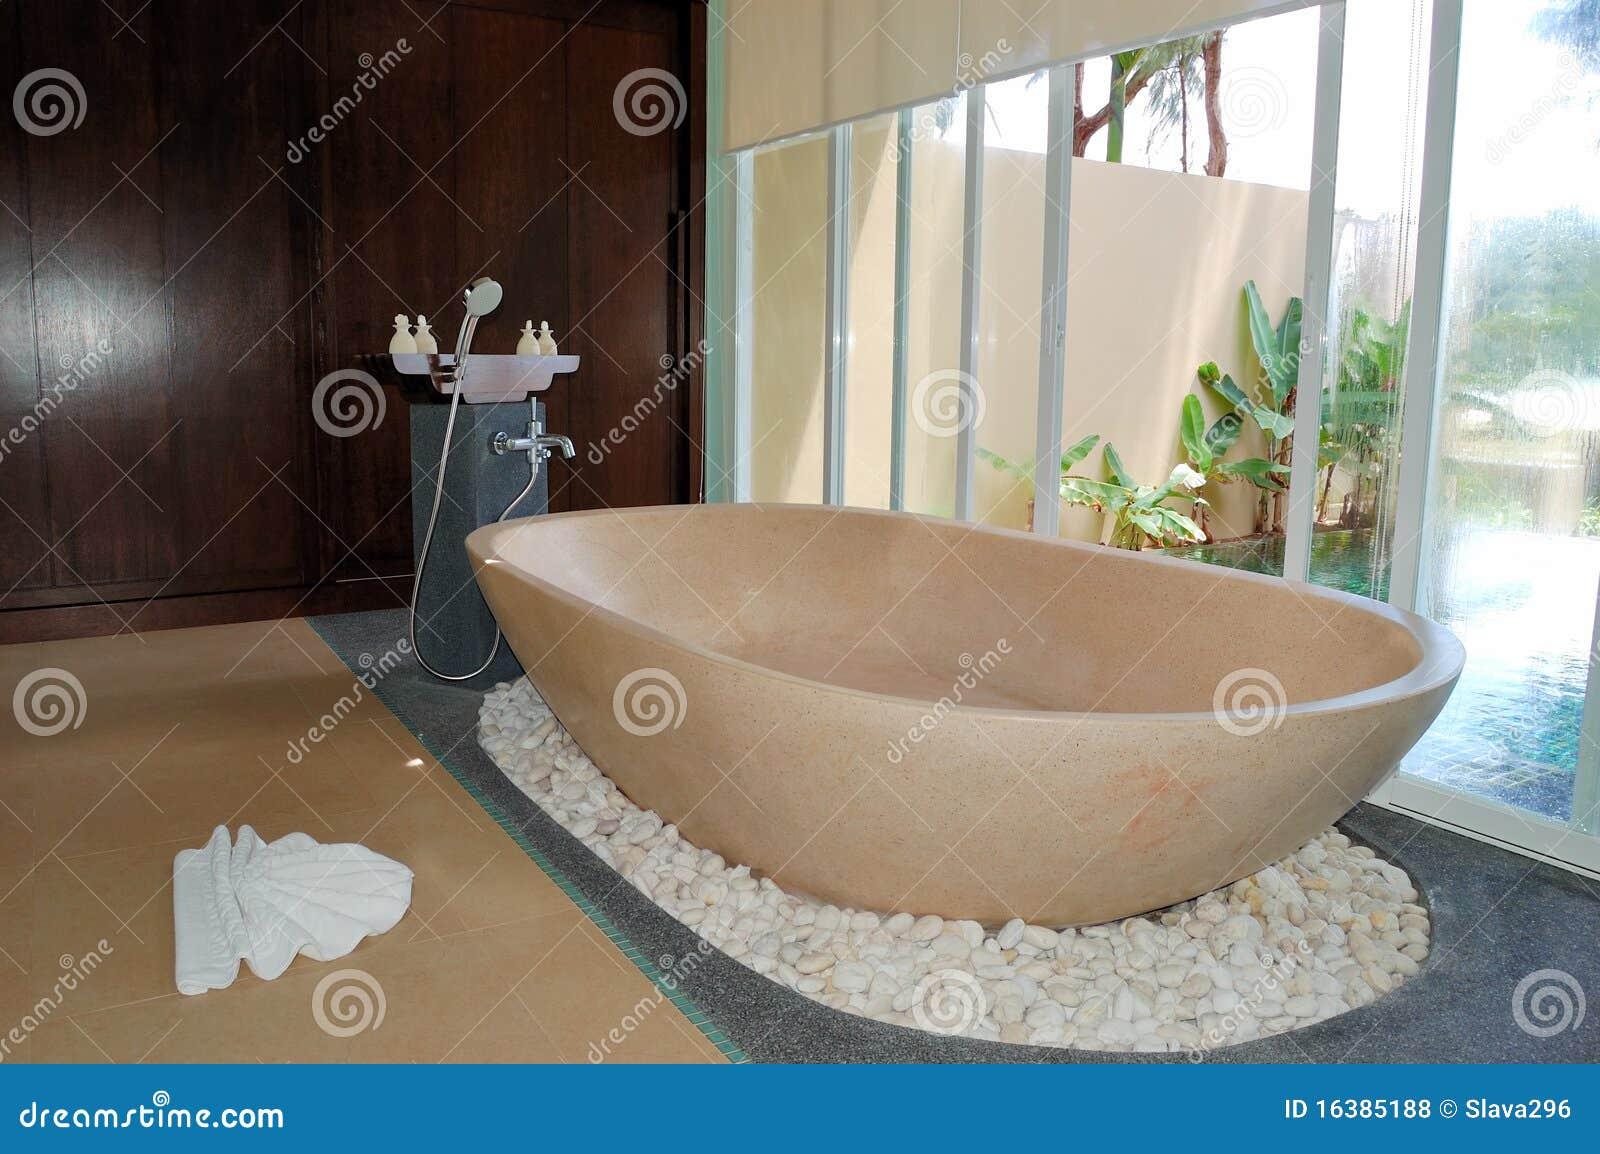 Bathroom at the luxury villa